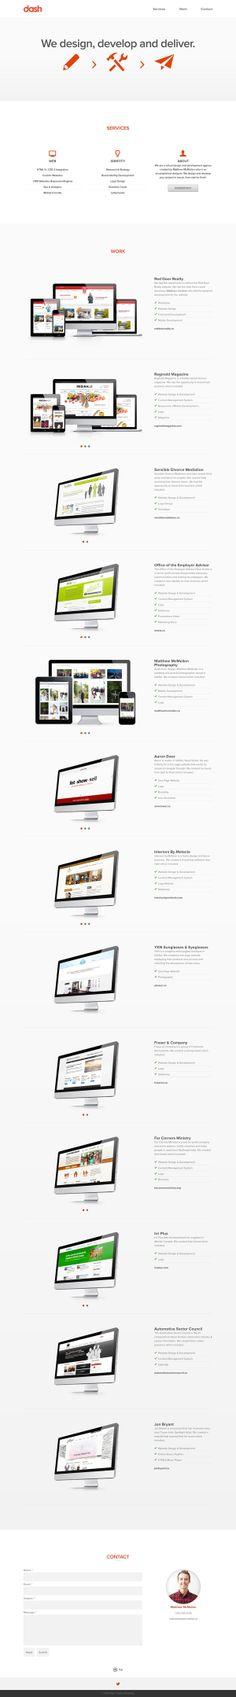 Single page web design